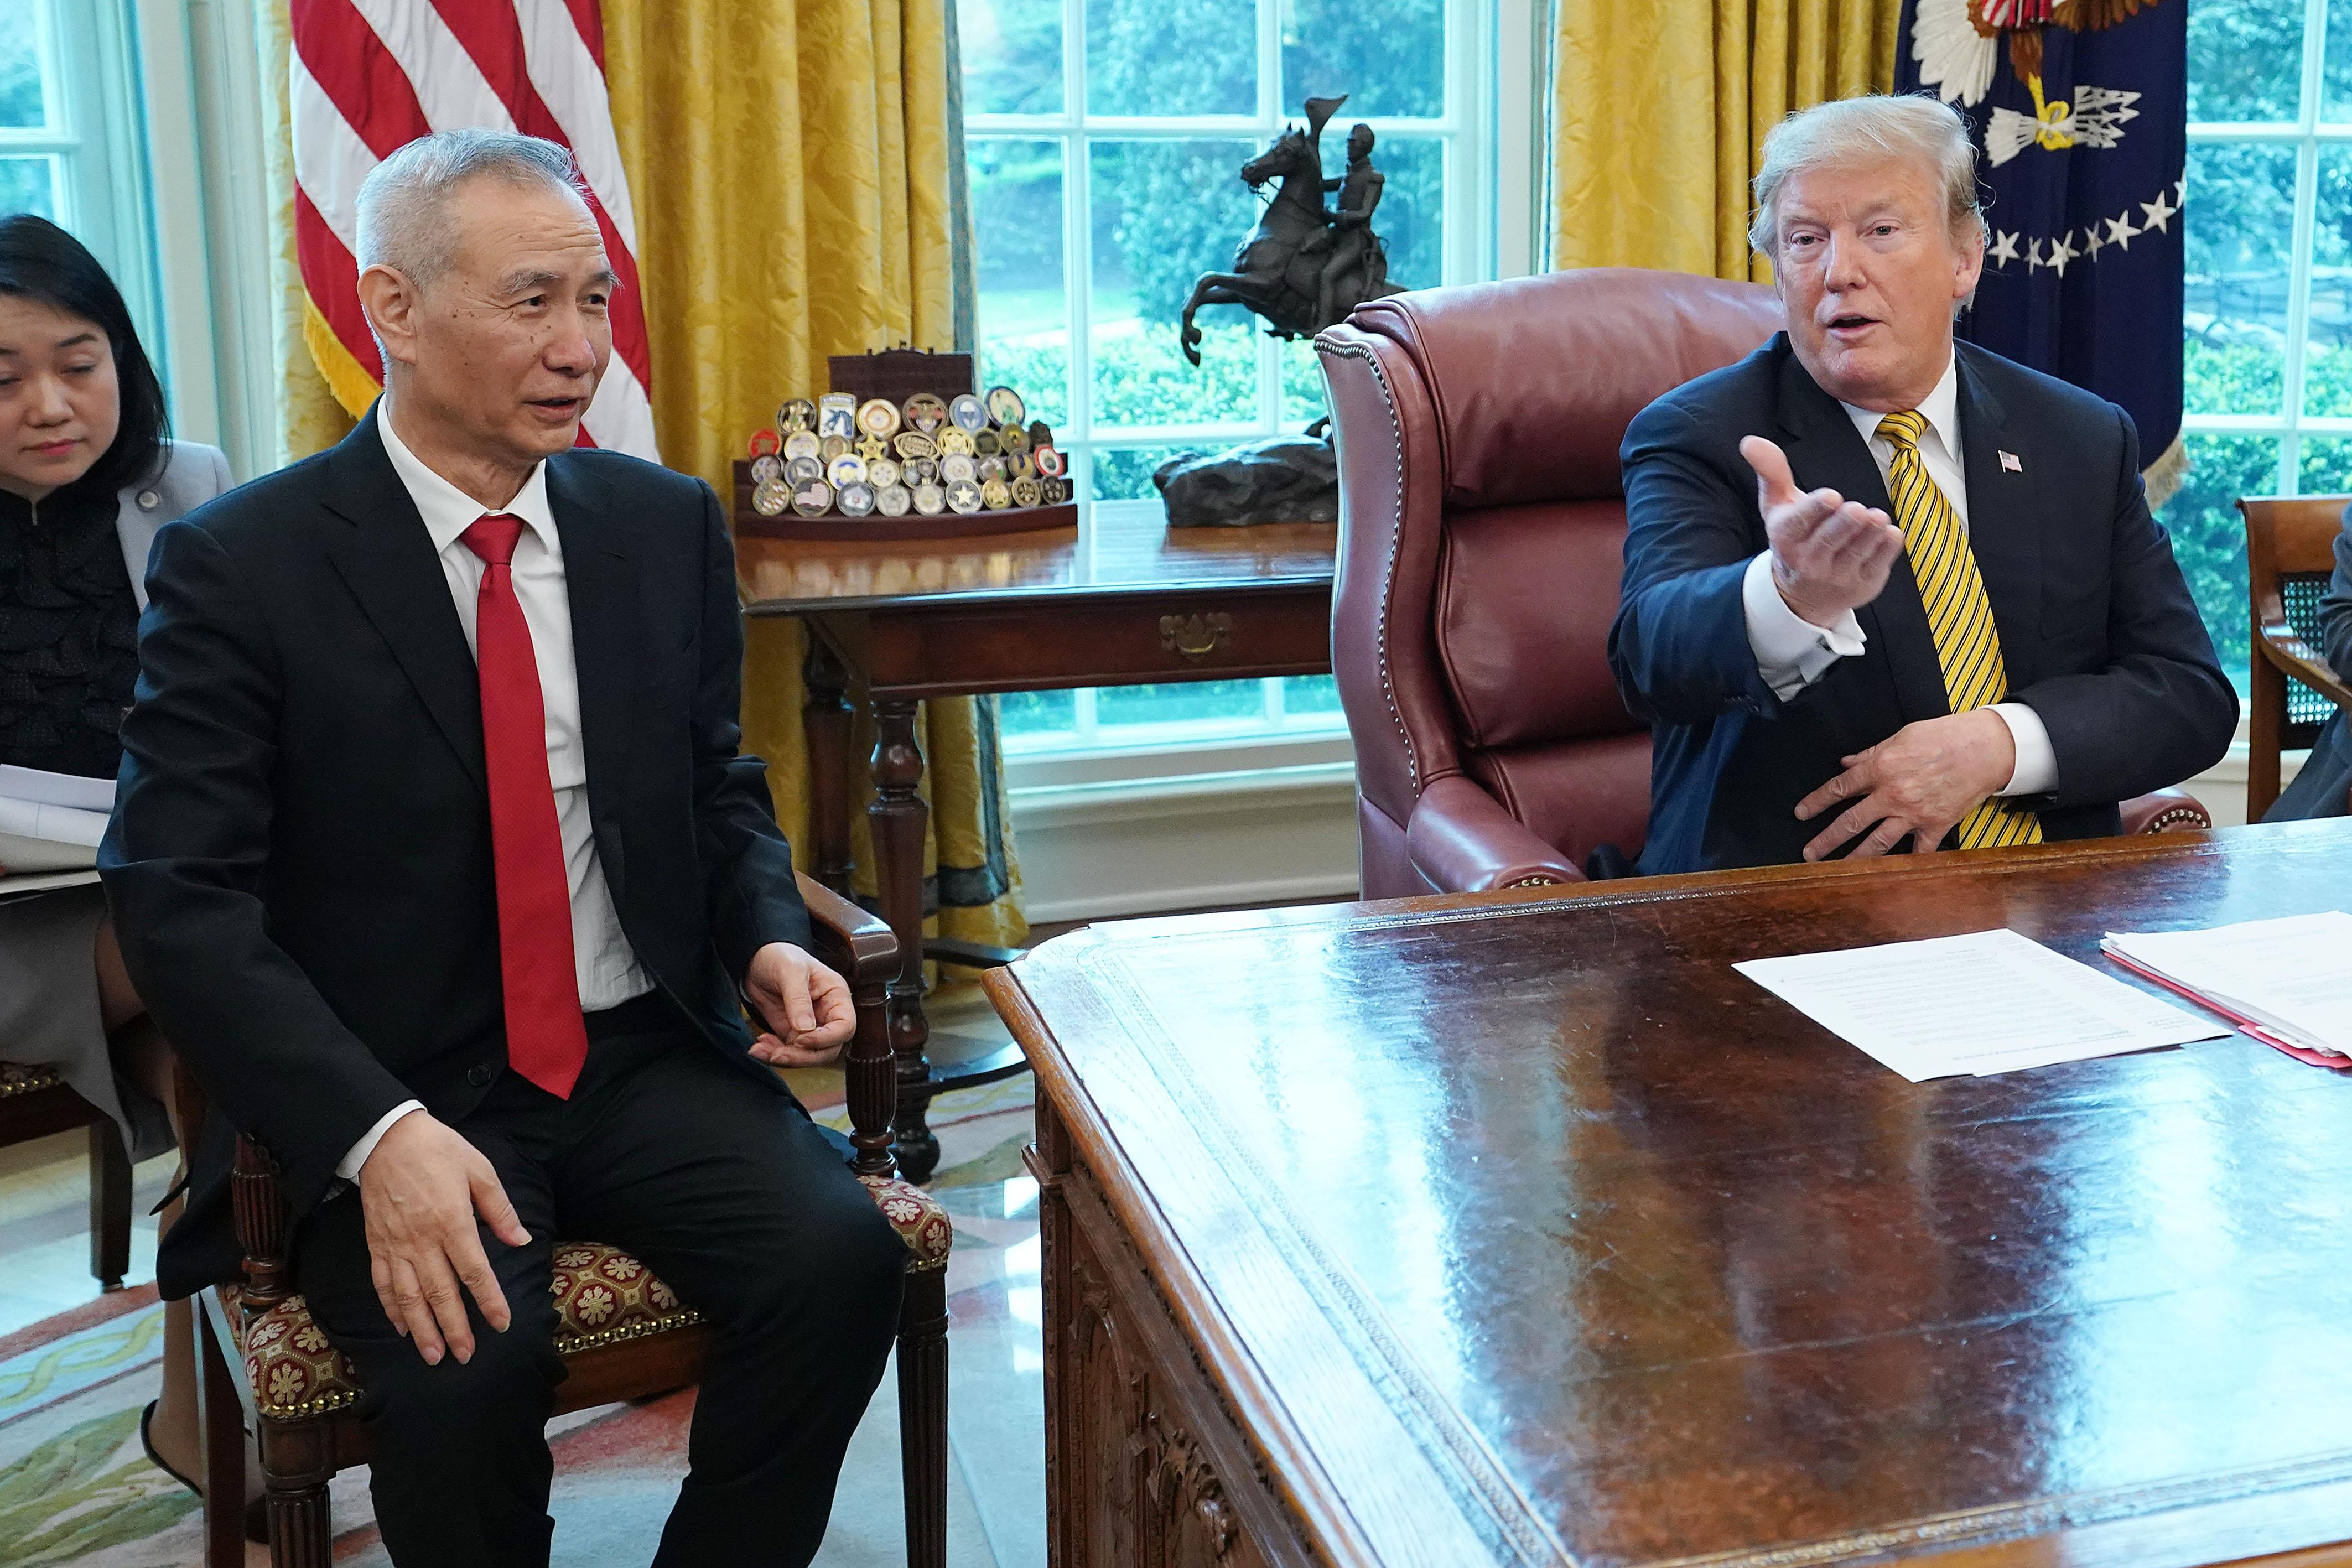 4月4日,美國總統特朗普在白宮接見中共副總理劉鶴。(Chip Somodevilla/Getty Images)